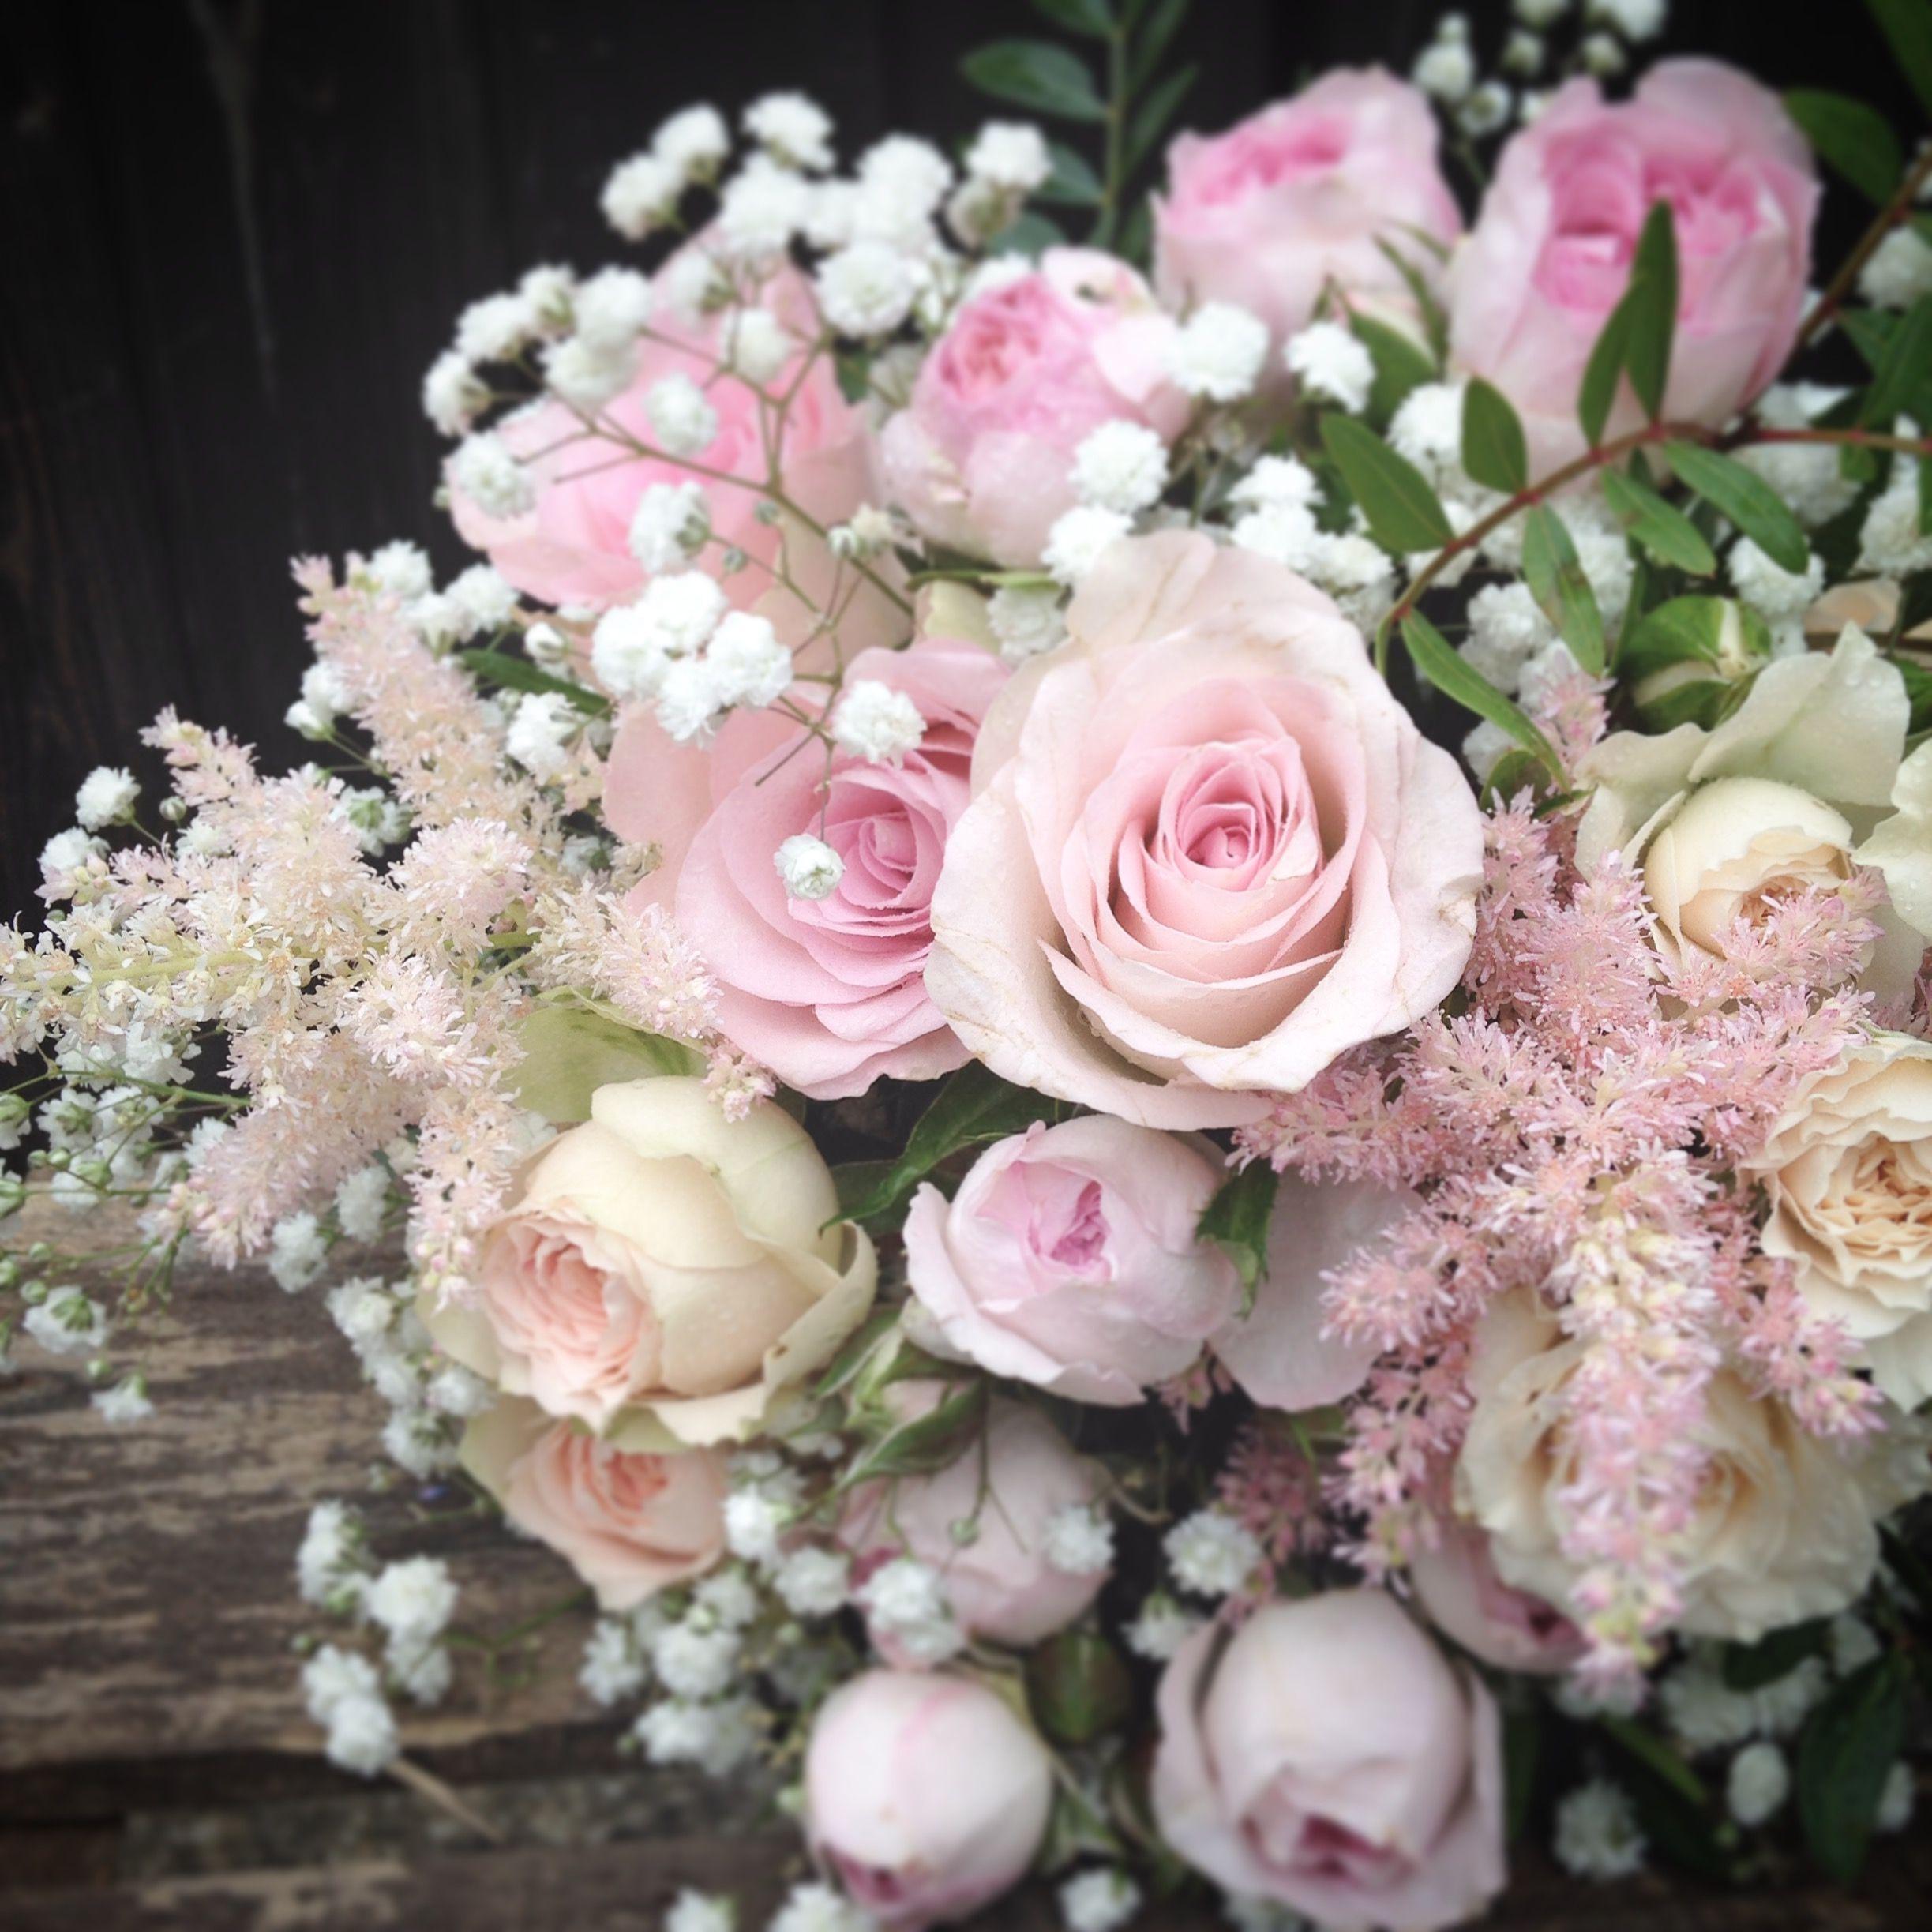 roses flowers gypsophila flower - photo #37